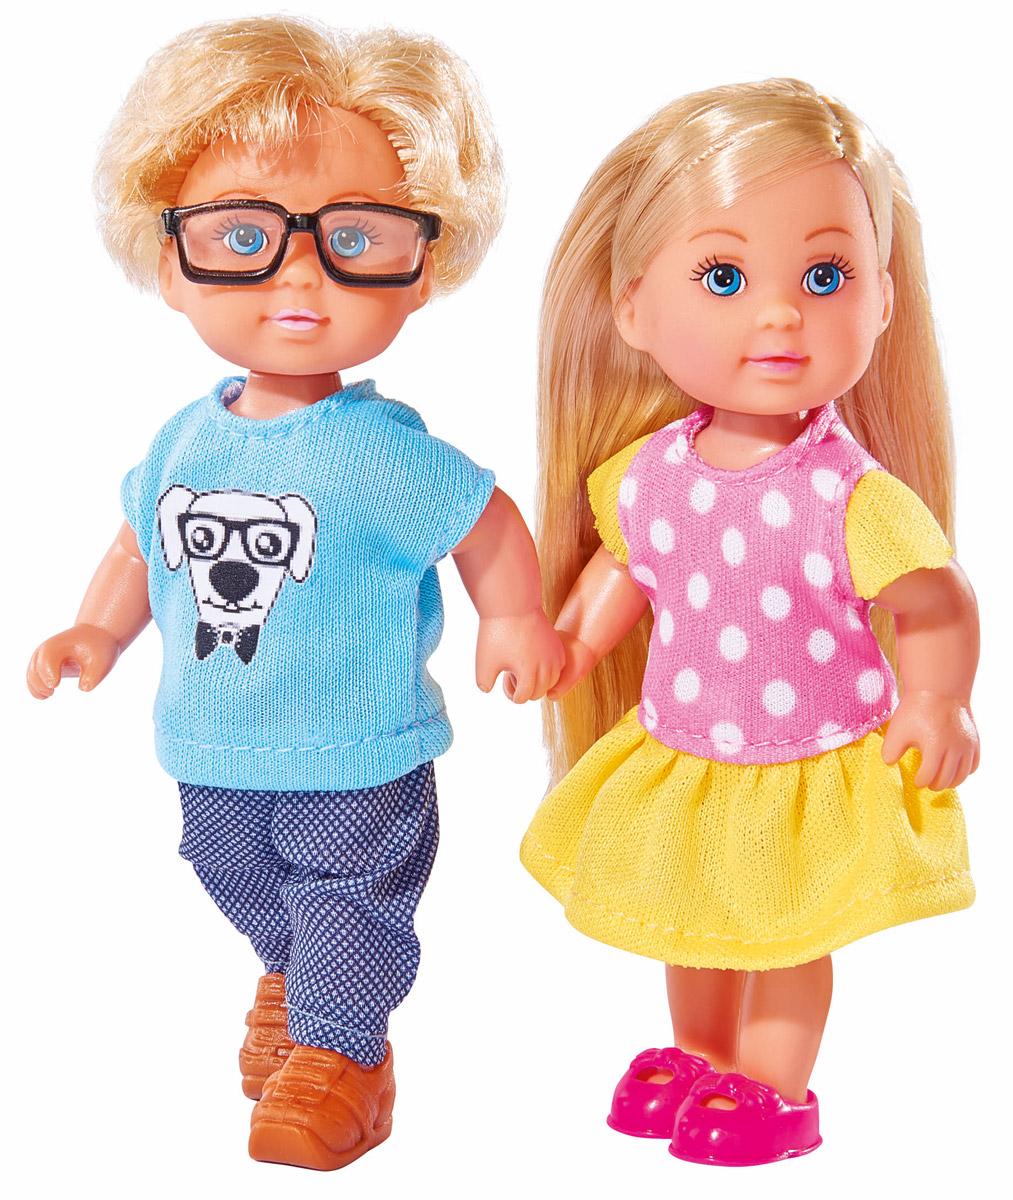 Simba Набор кукол Еви и Тимми куклы и одежда для кукол simba кукла еви и тимми на аттракционах 12 cм